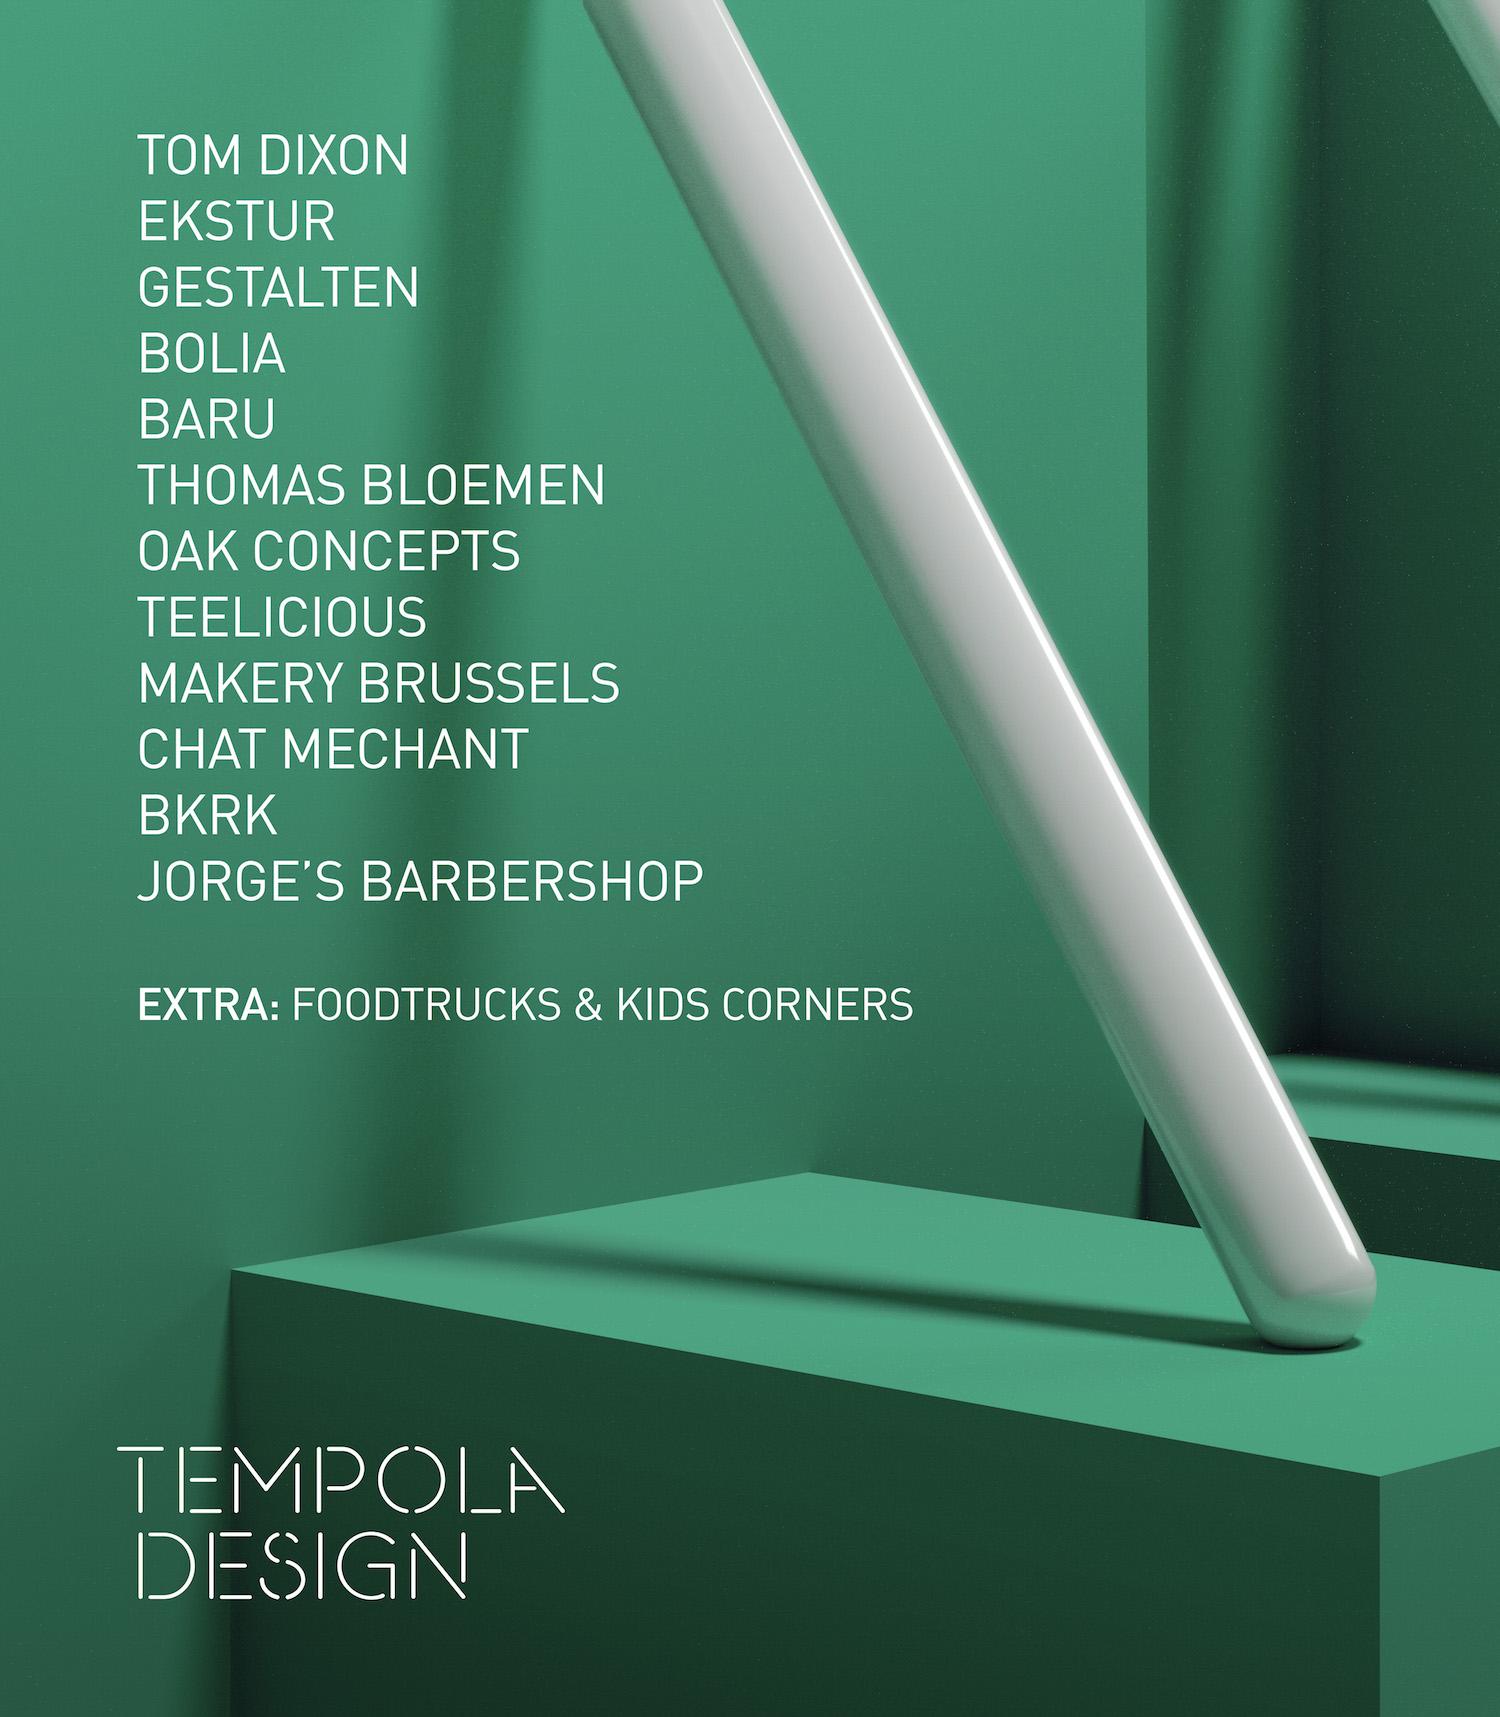 TEMPOLA_GreenRoom_Names01.jpg